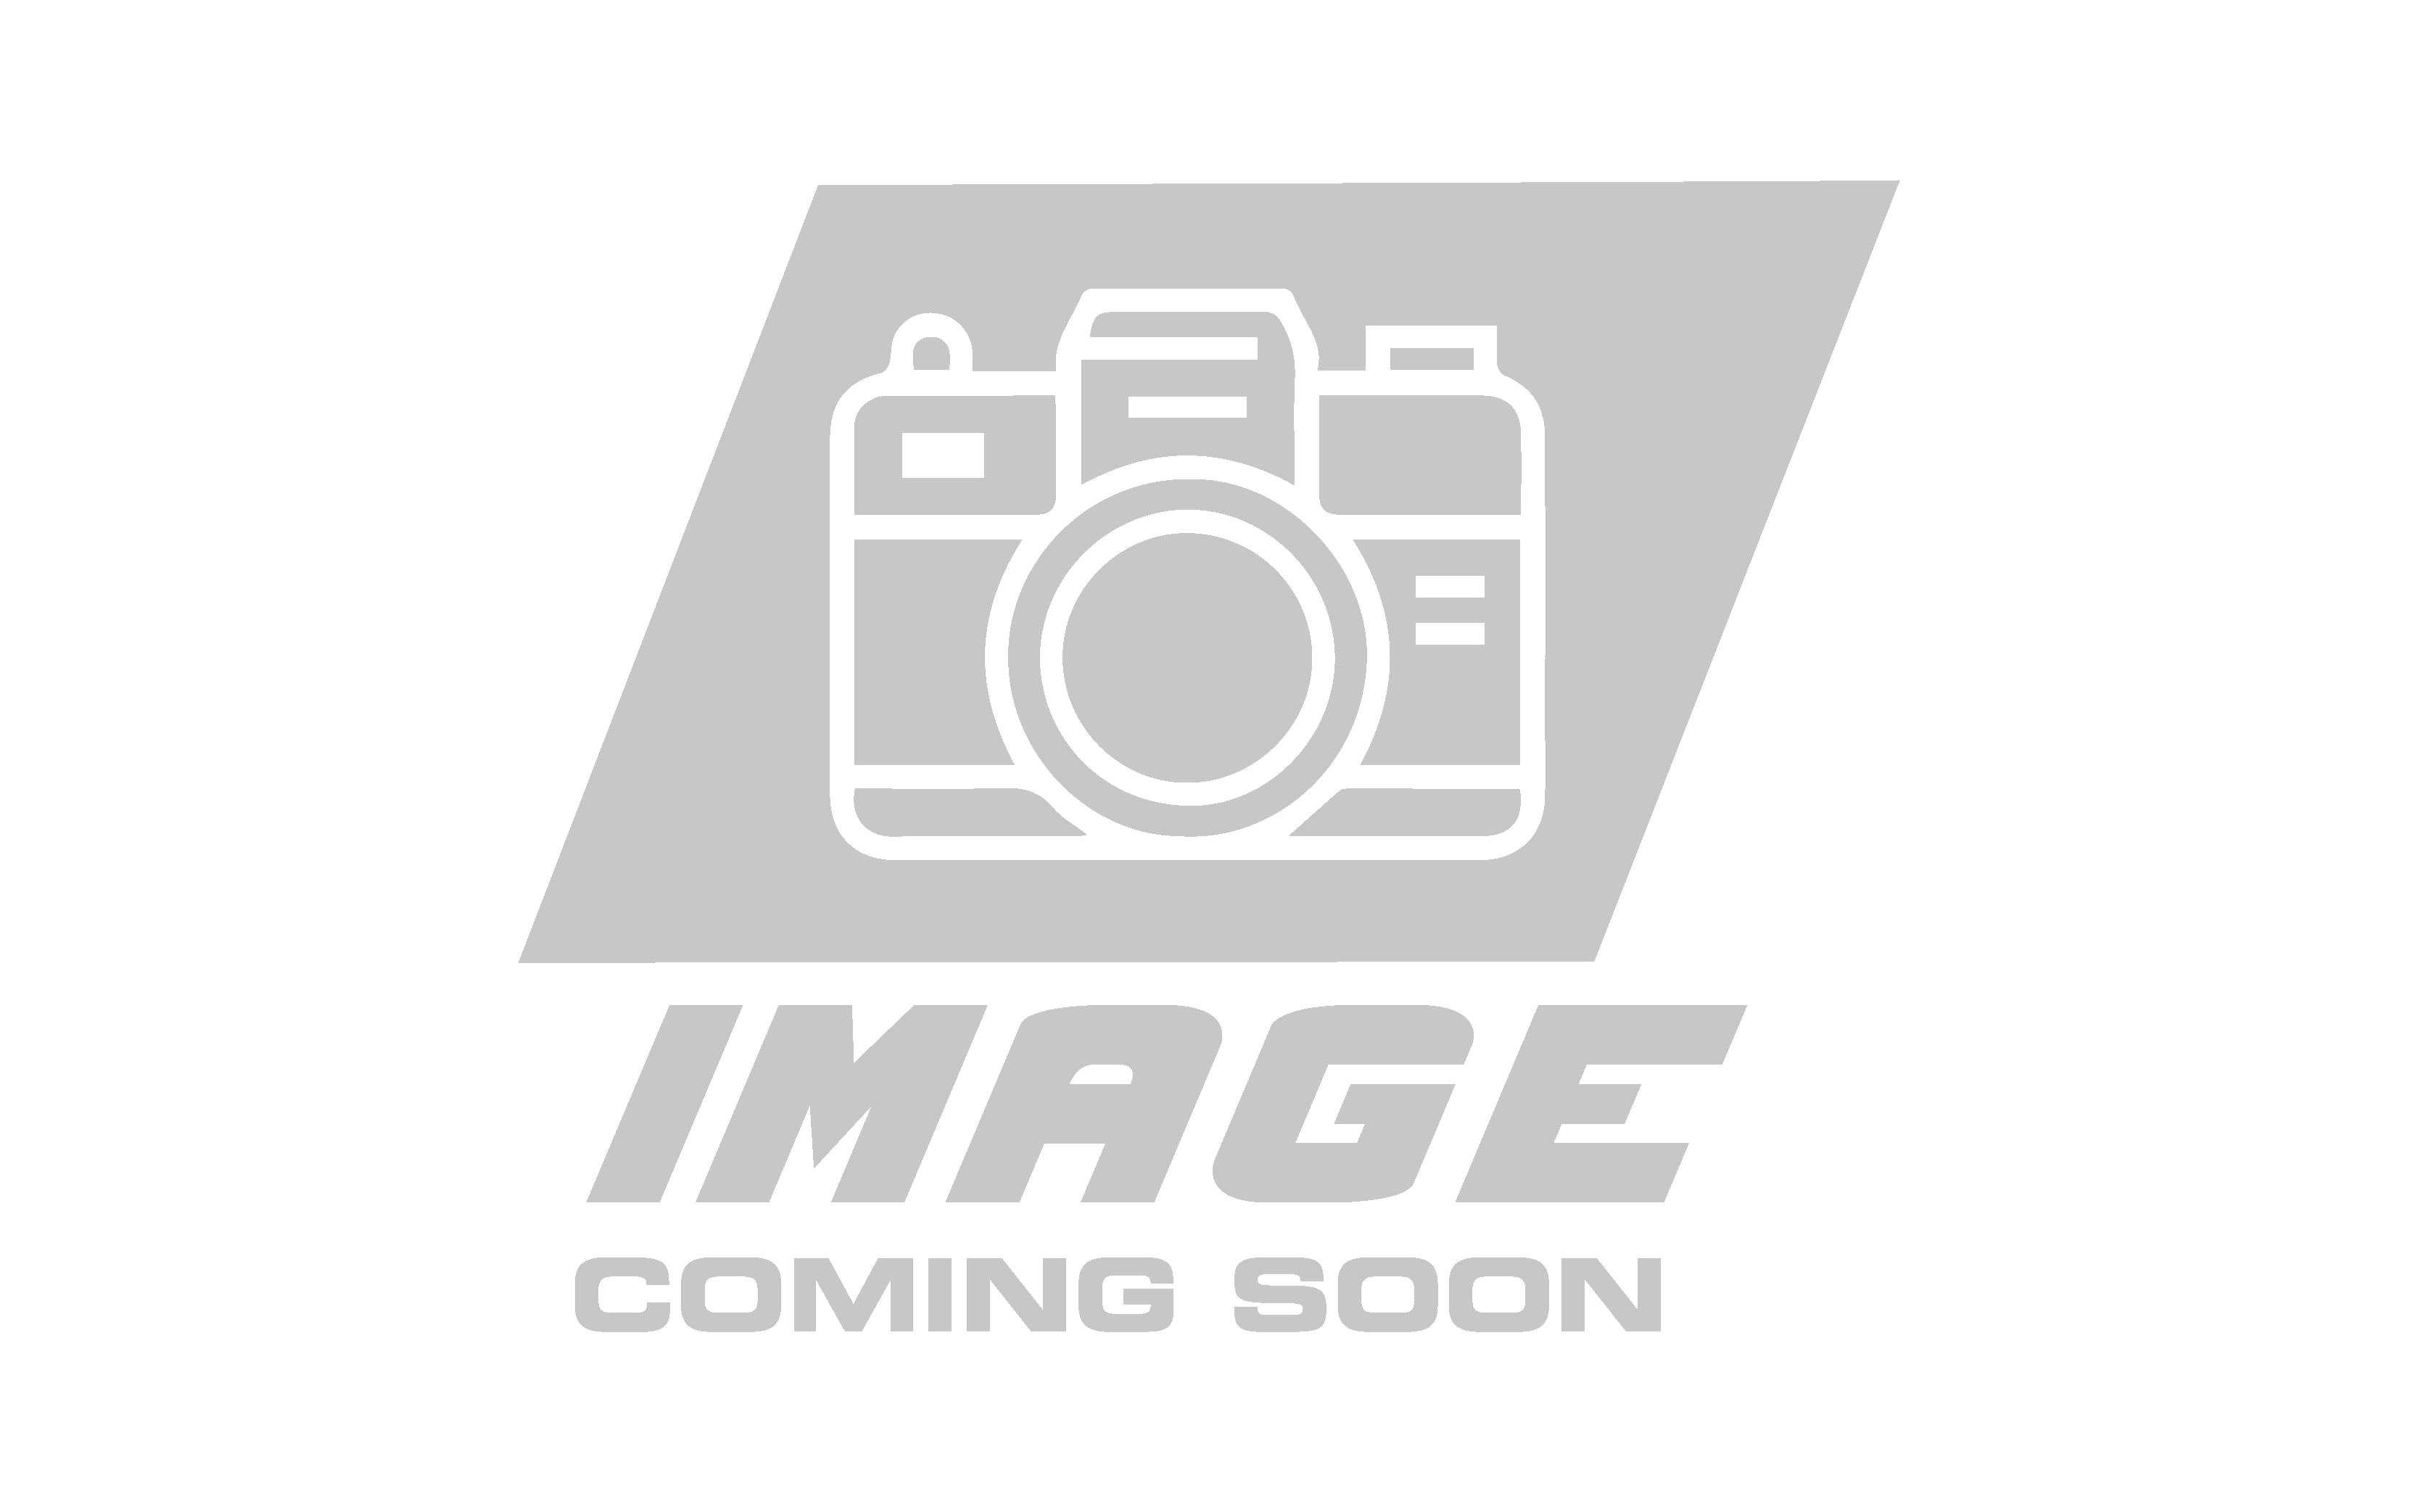 porsche_911_964_air_lift_performance_series_sleeve_style_1